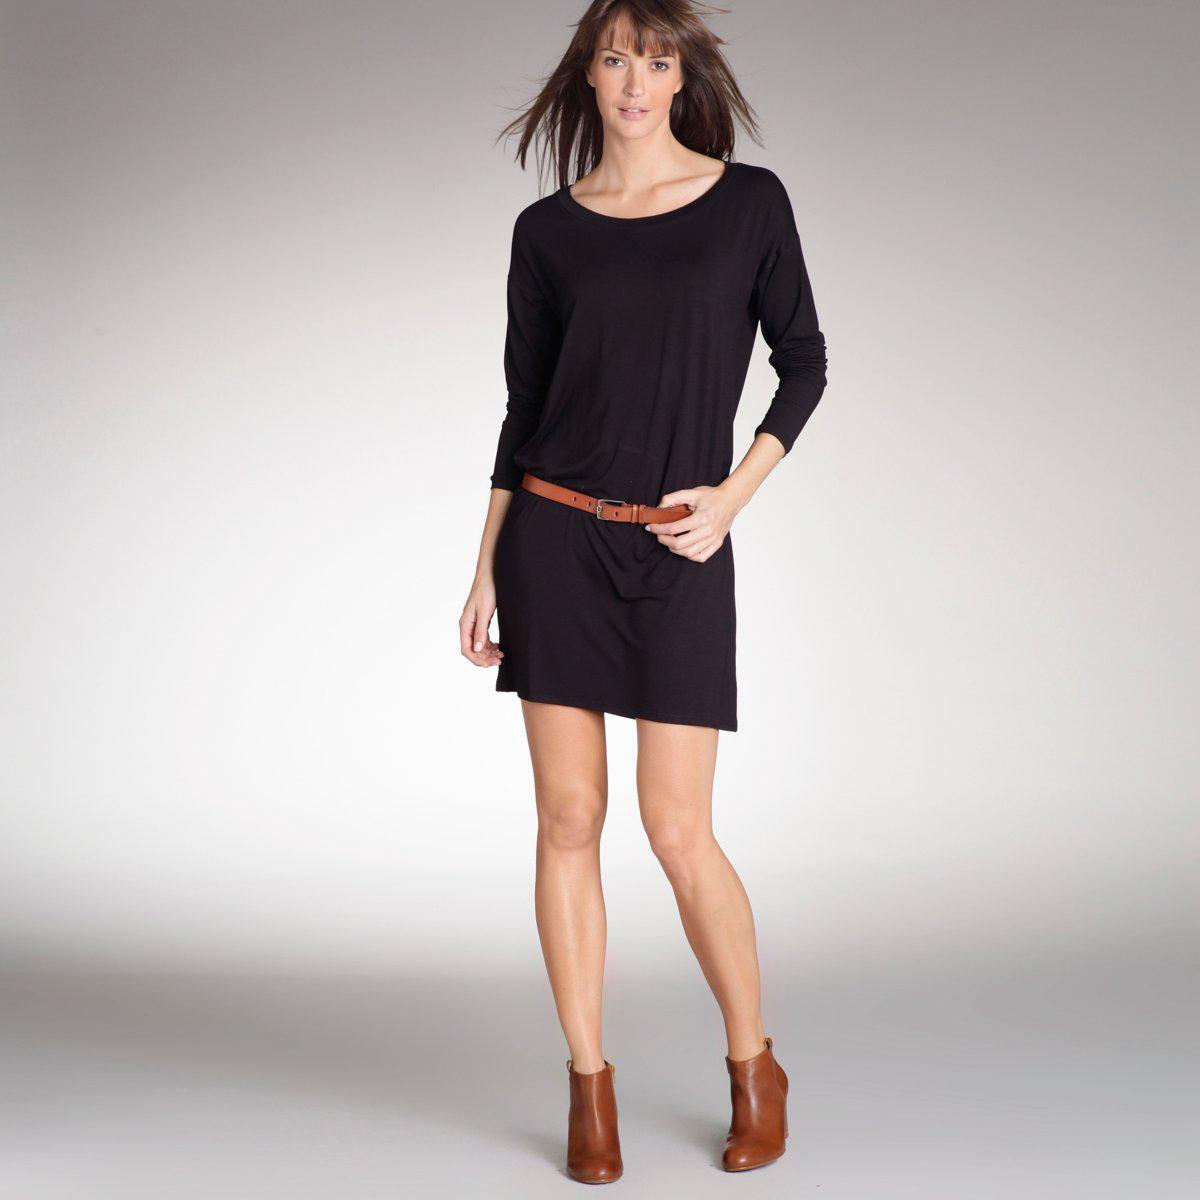 c27255e3db82 Βραδυνα Φορεματα LaRedoute Φθινόπωρο 2011 Κωδ. 324259570